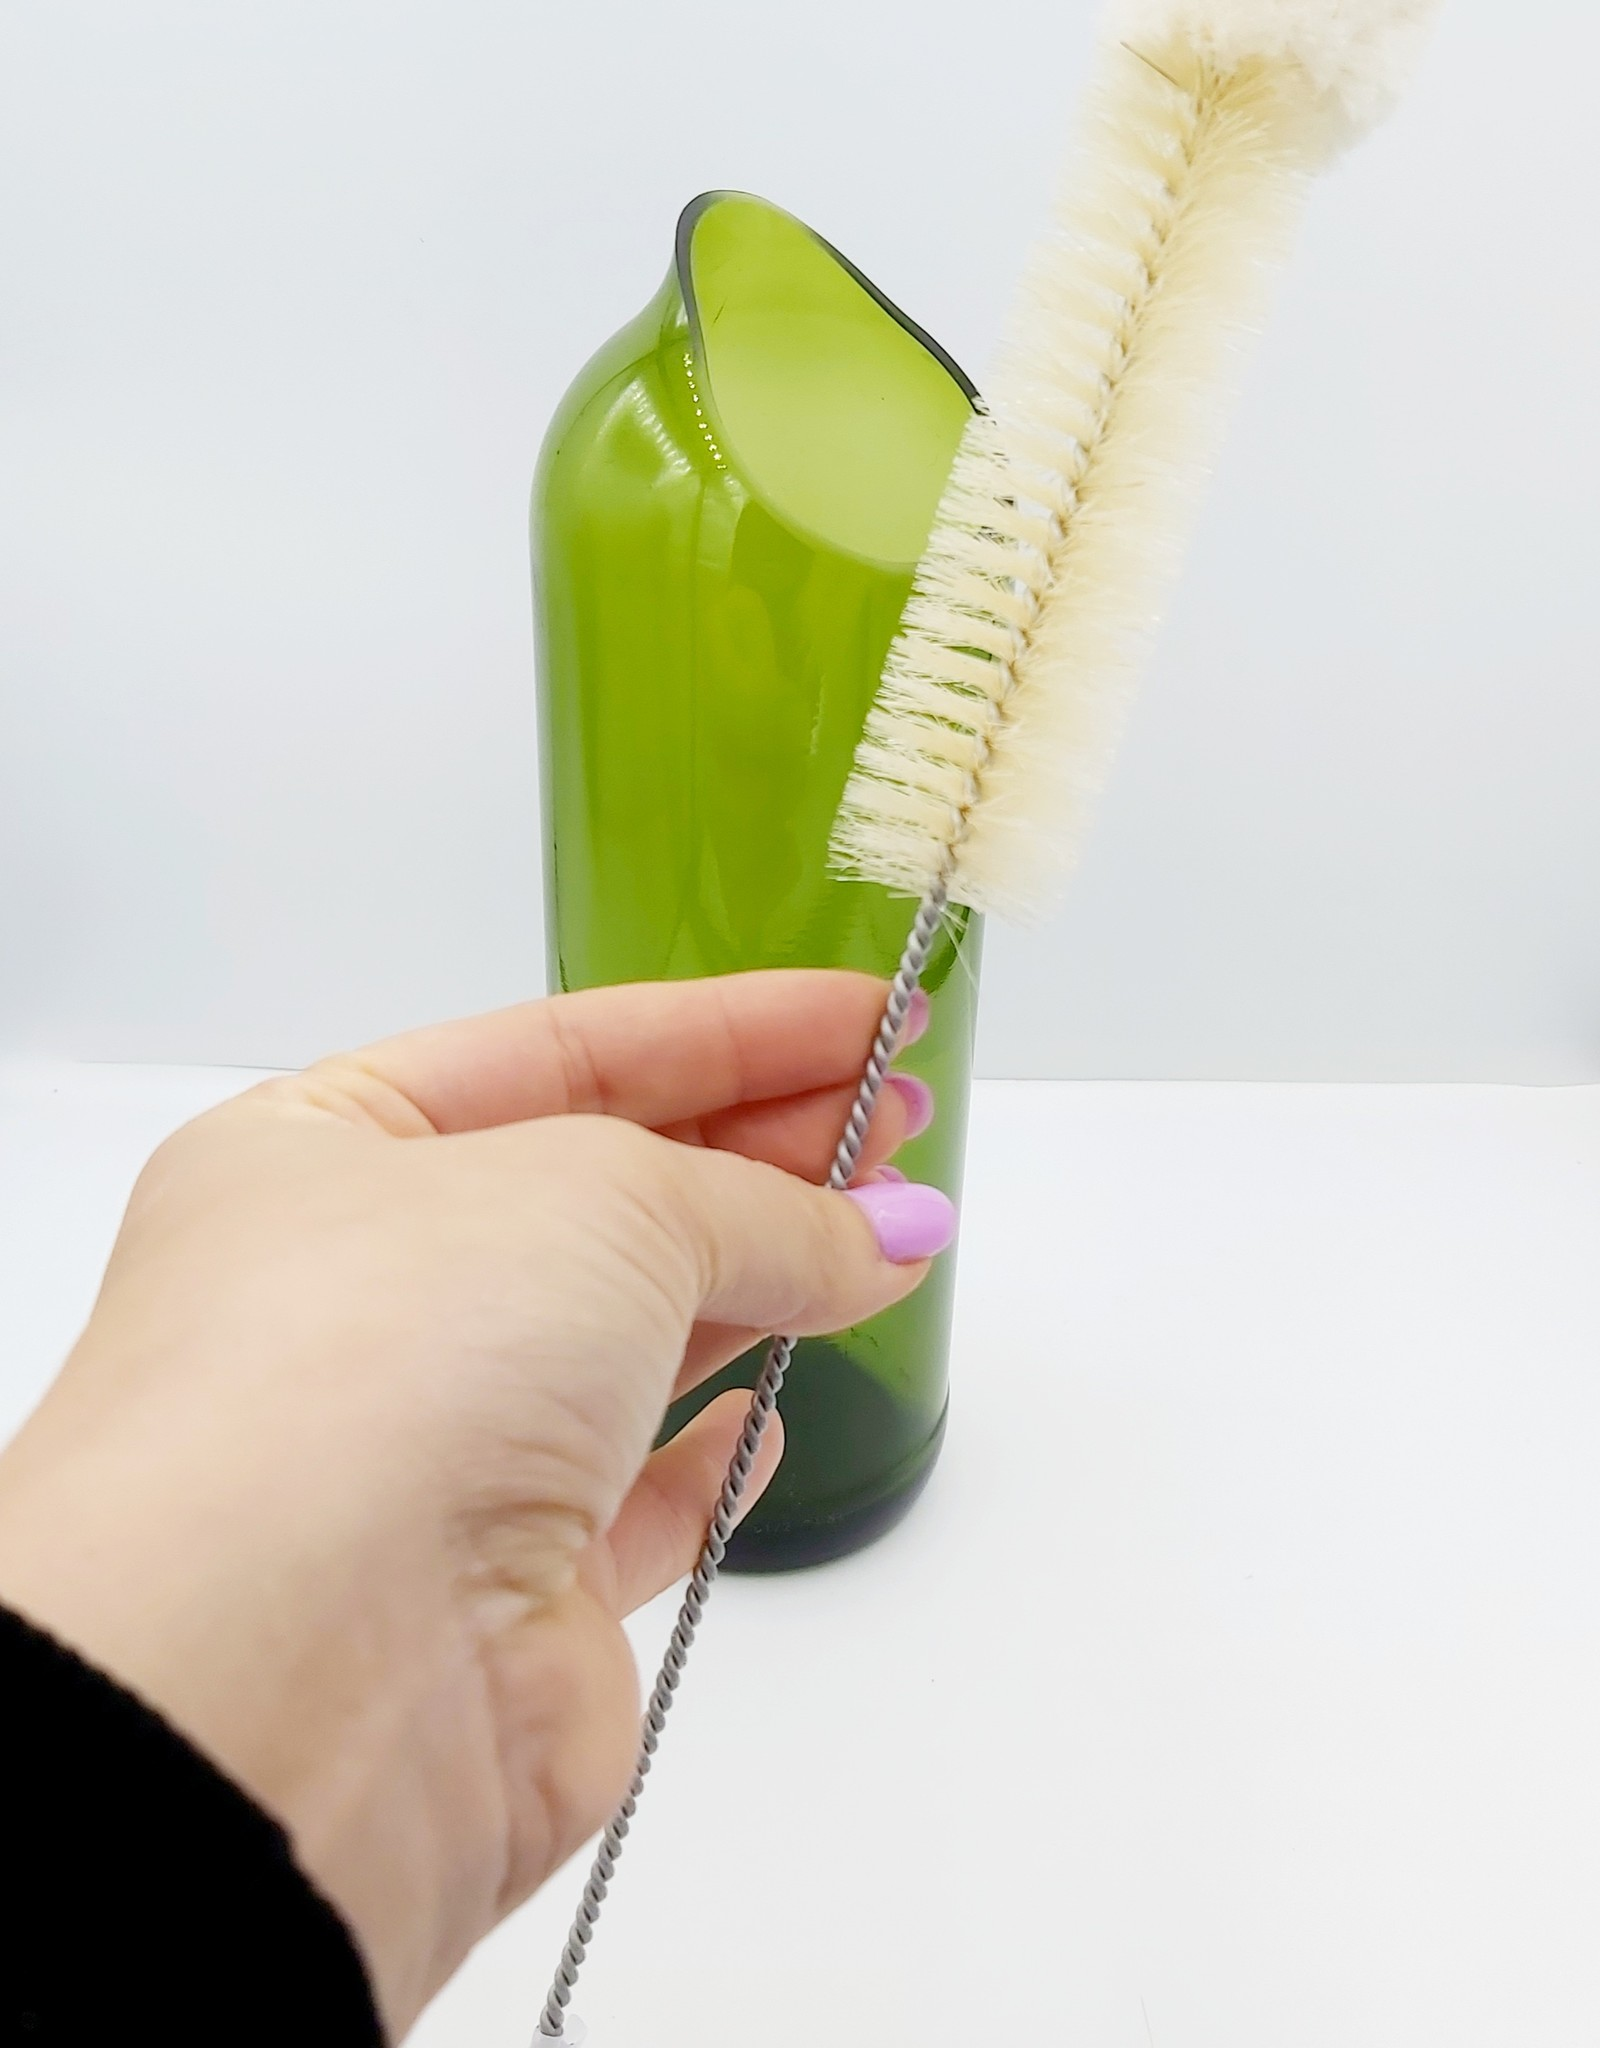 Redecker Reinigingsborstel met wollen kop